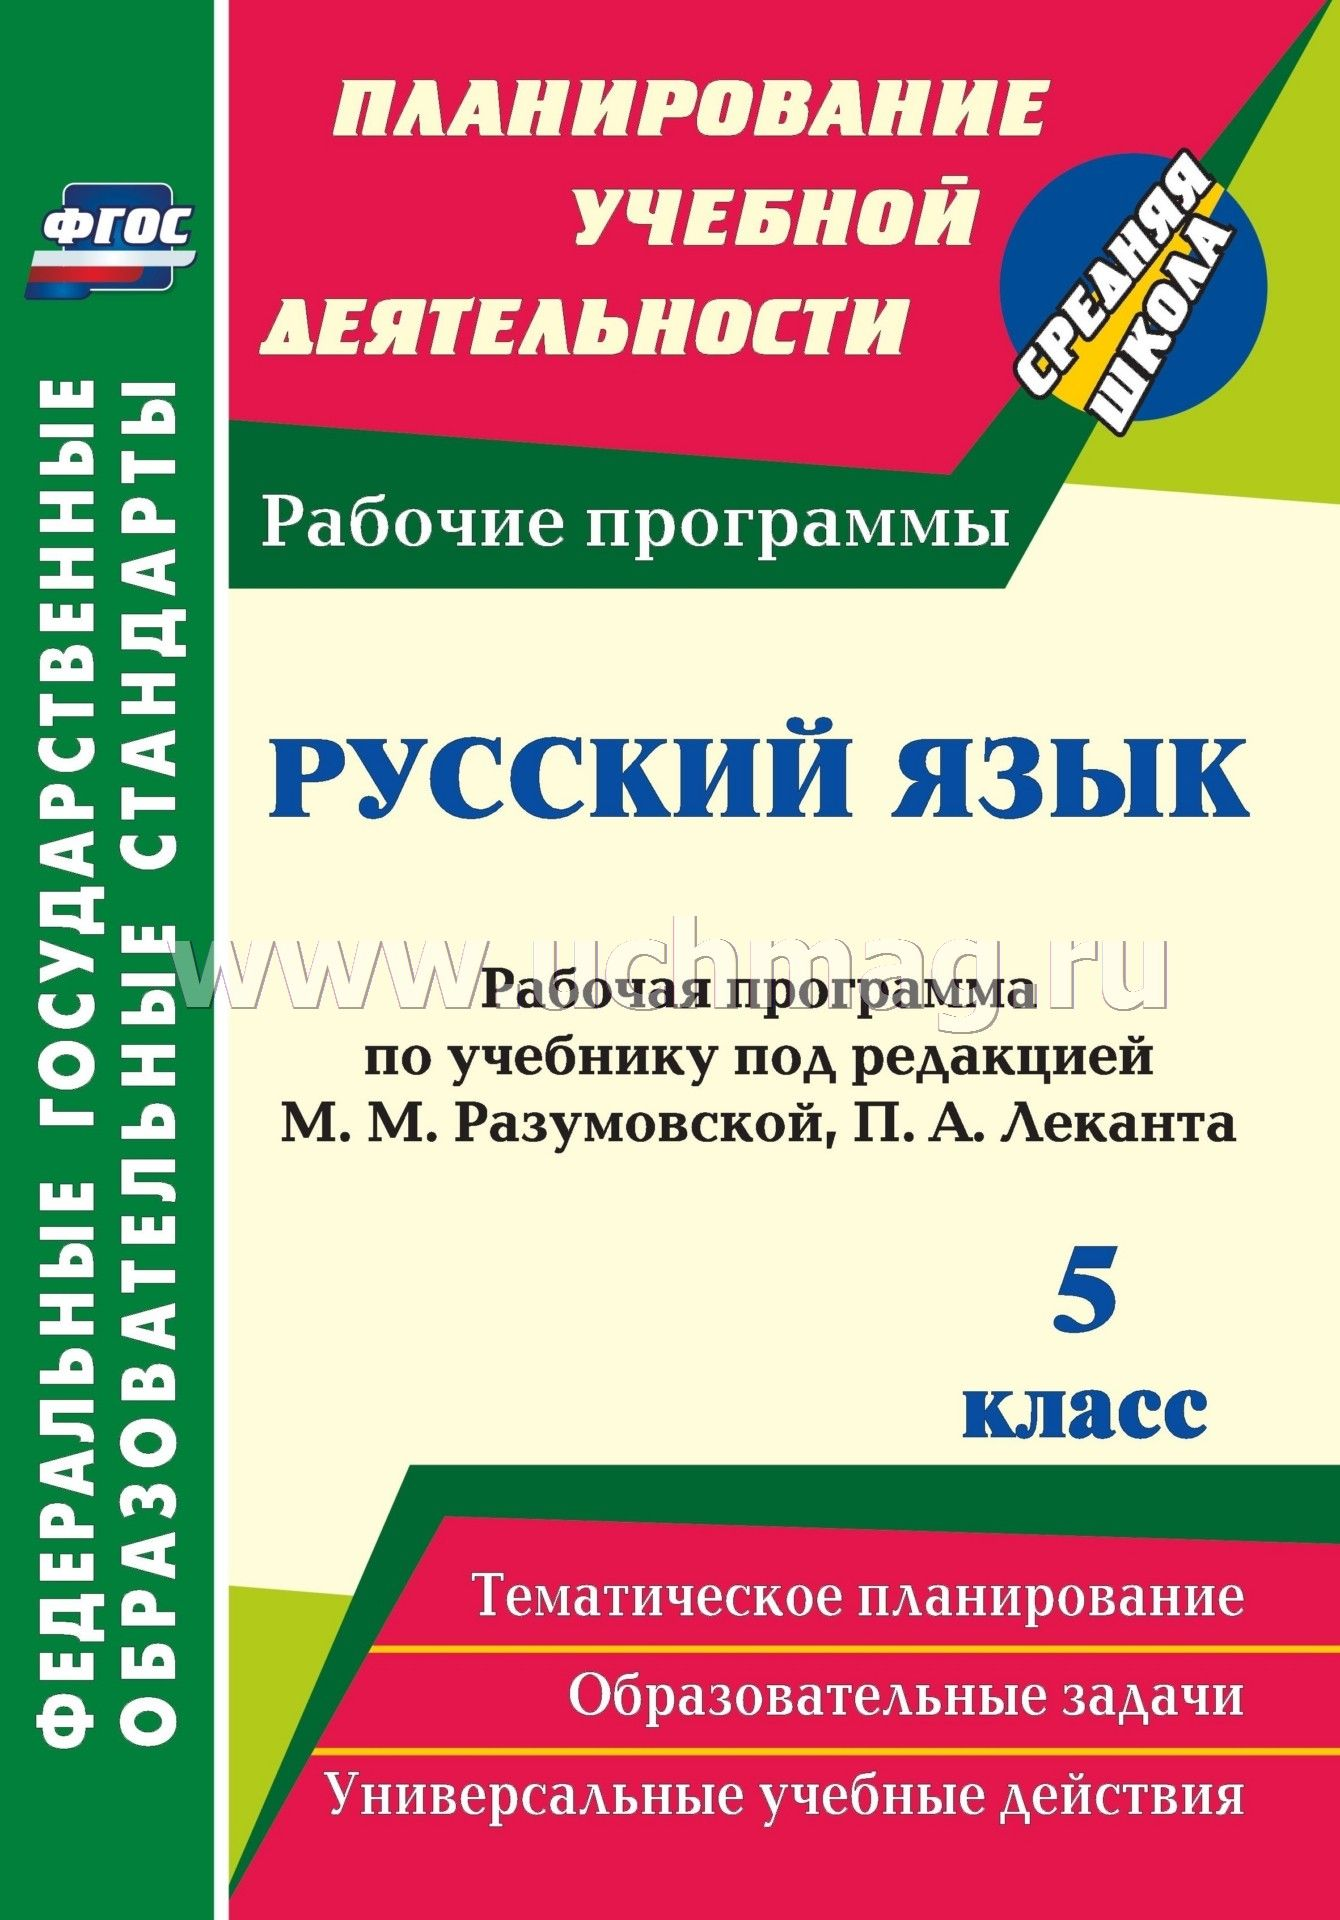 Гдз По Русскому Языку 5 Класс Мм Разумовская 2013